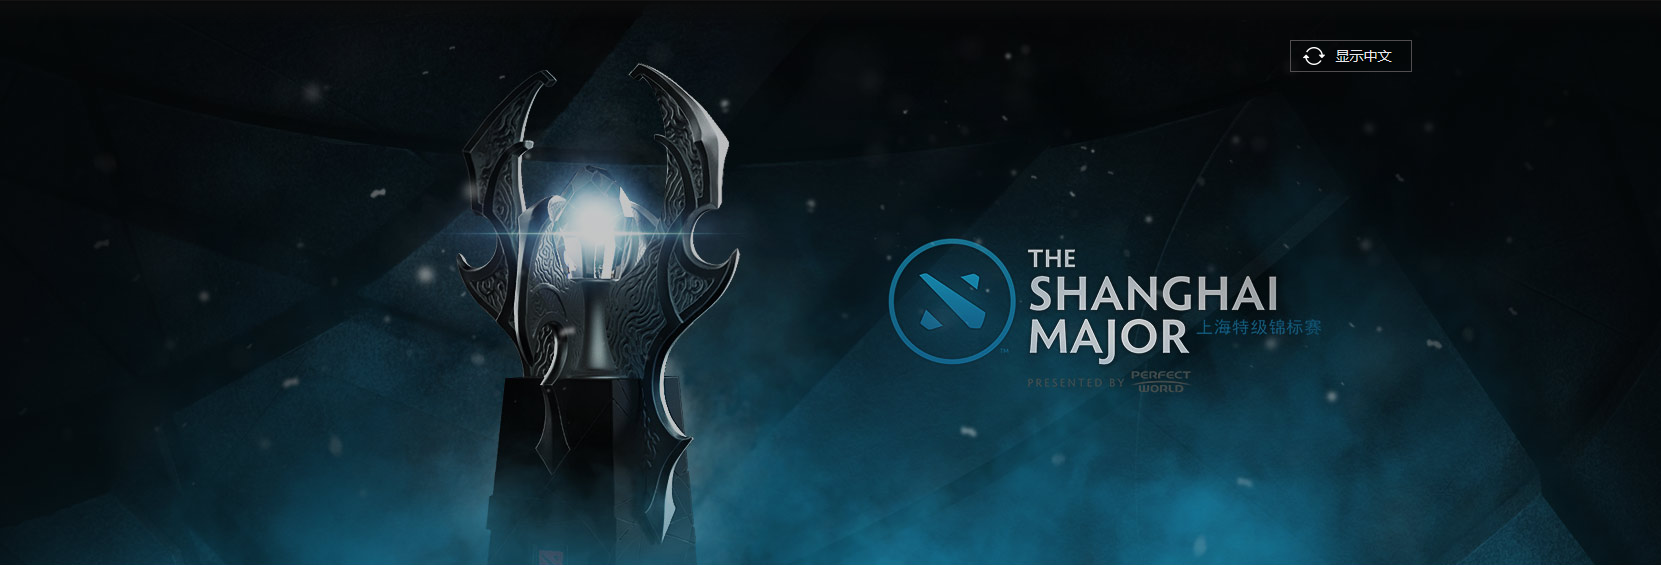 Обзор турнира The Shanghai Major 2016 по Dota 2